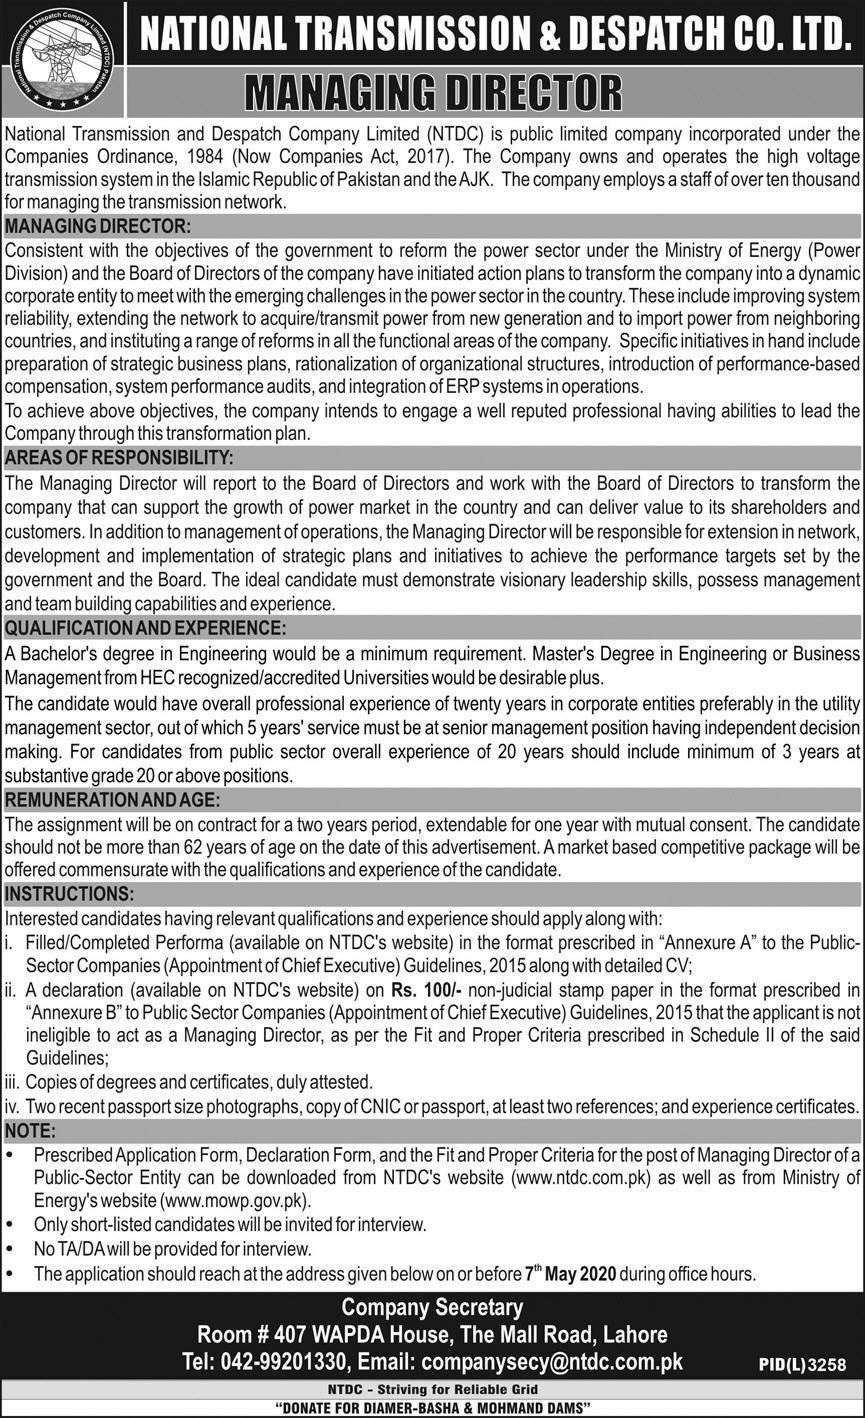 Wapda NTDC Jobs 2020 Apply Online